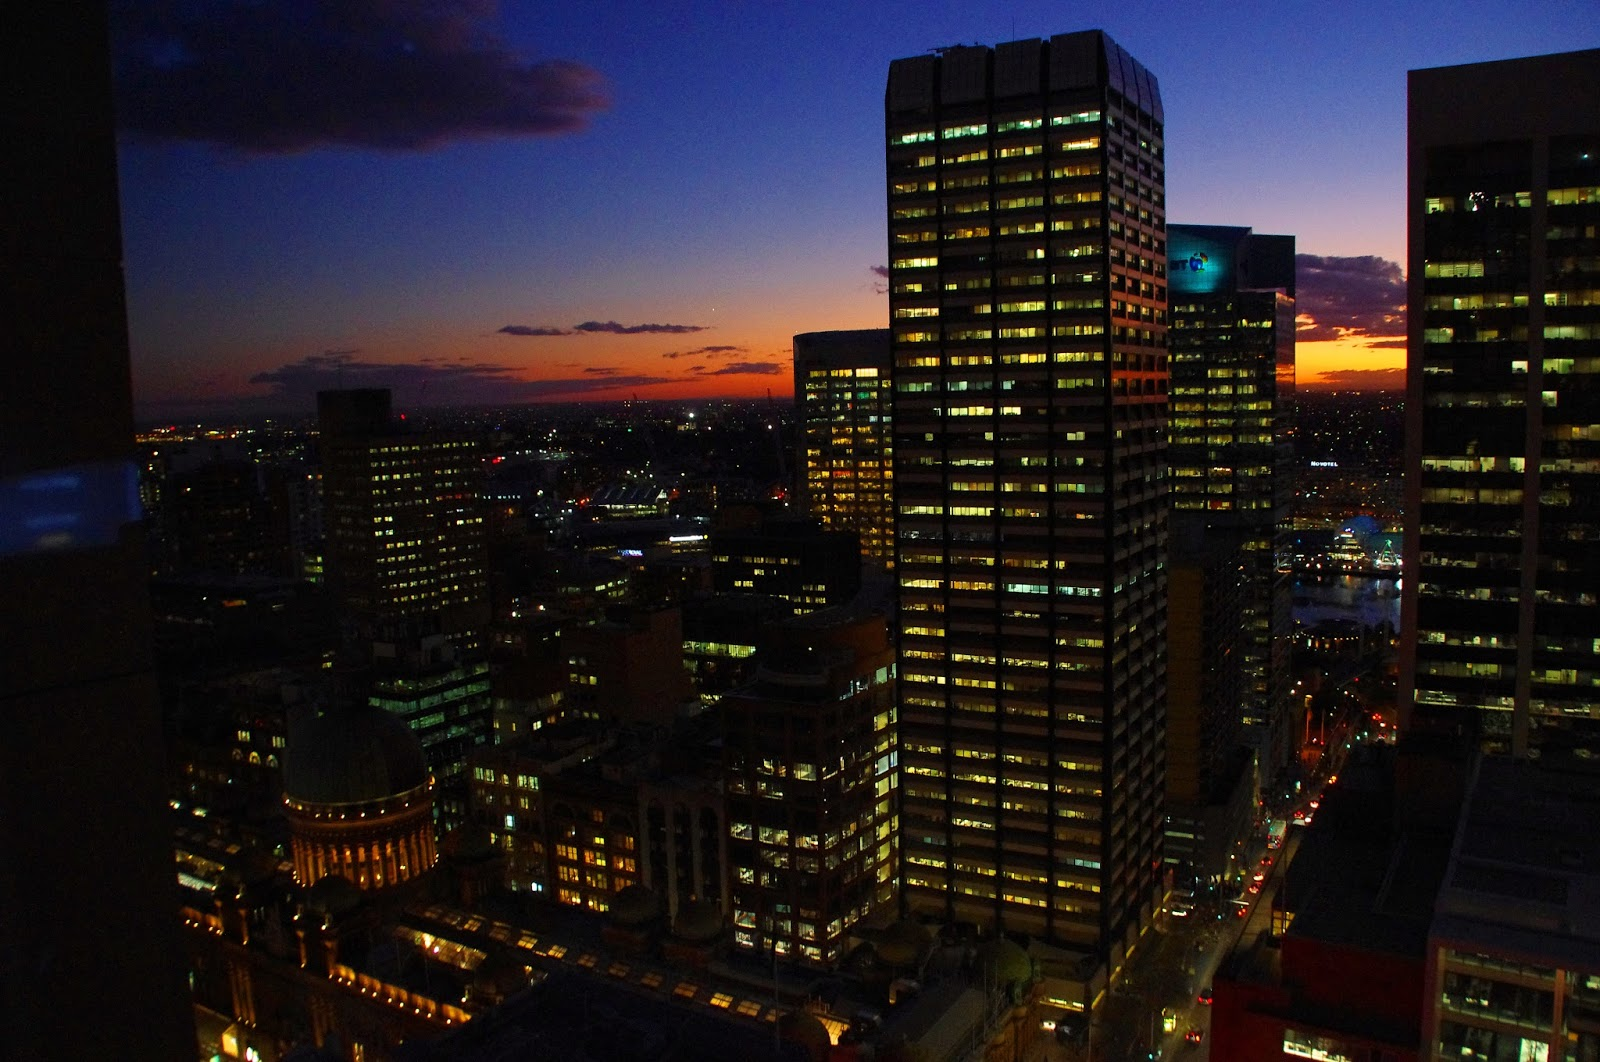 Sunset over Sydney skyline